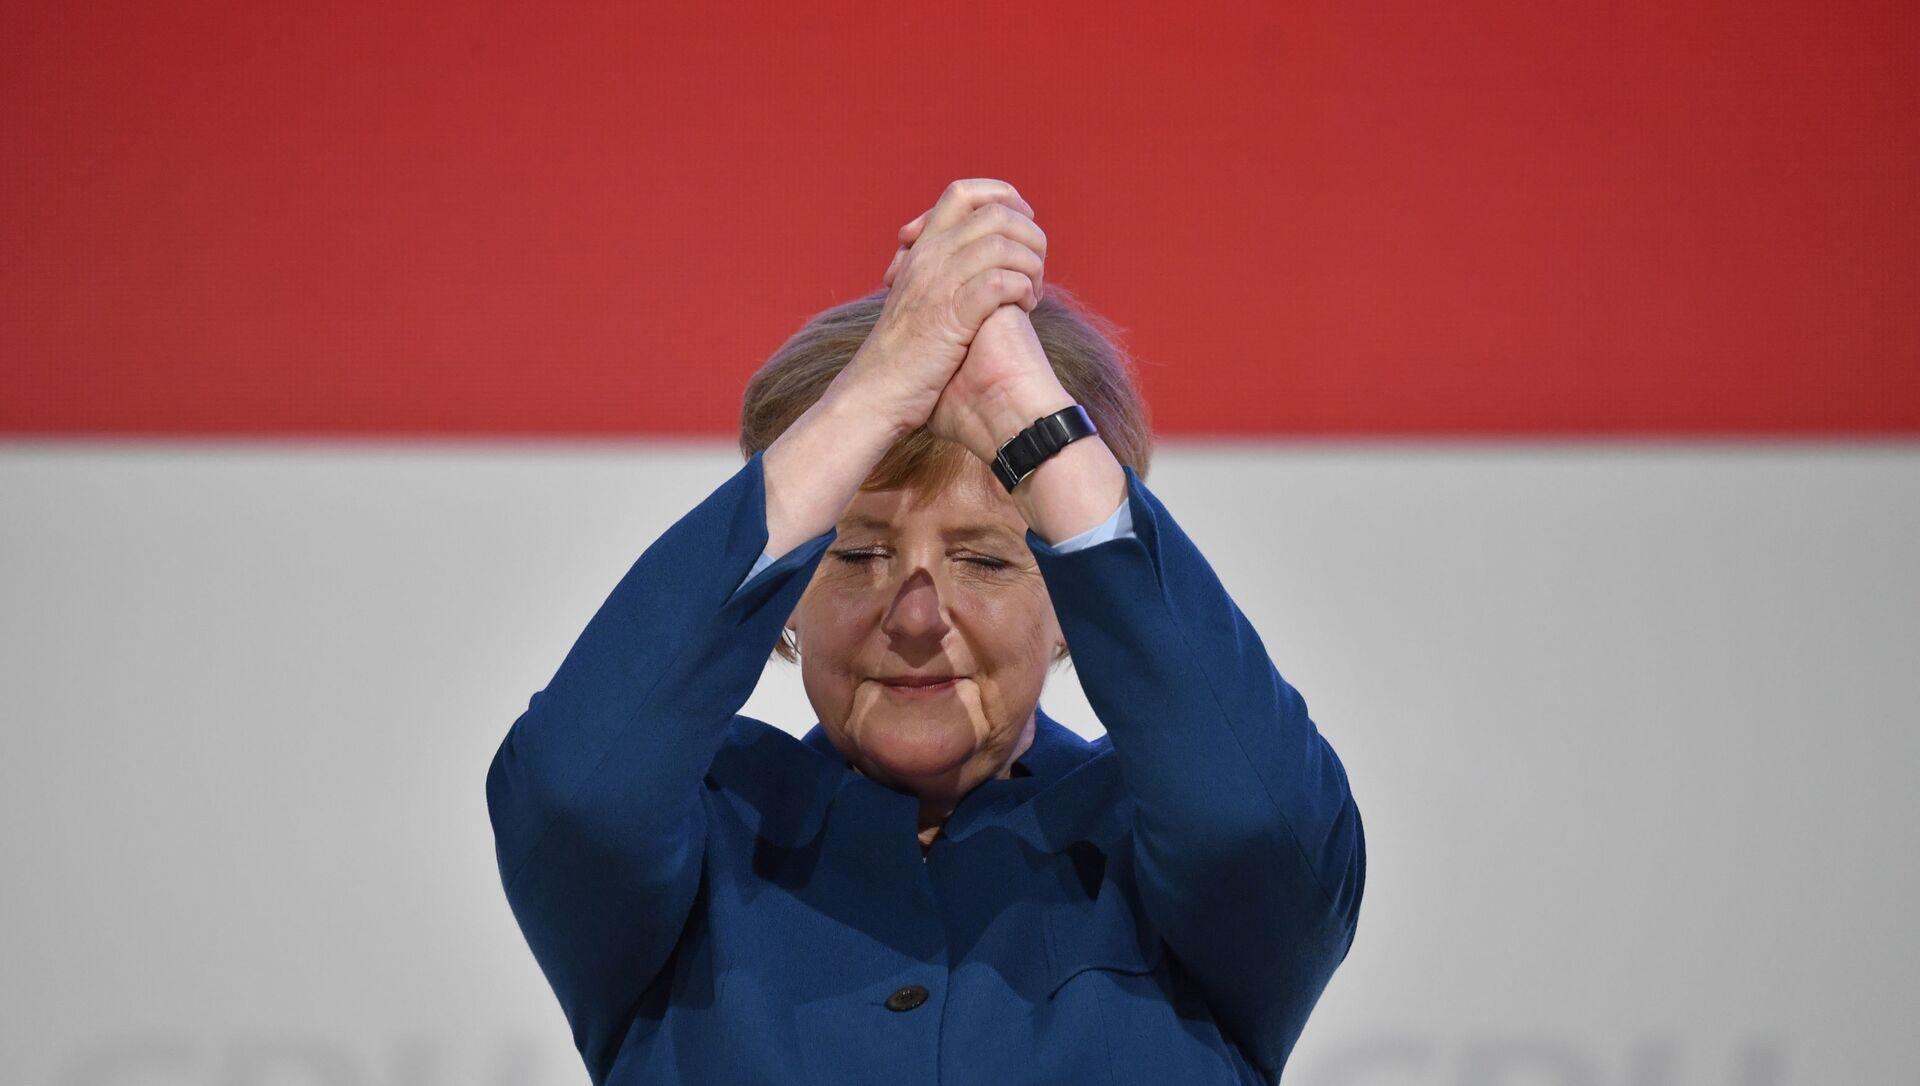 Канцлер Германии Ангела Меркель  - Sputnik Mundo, 1920, 08.01.2021